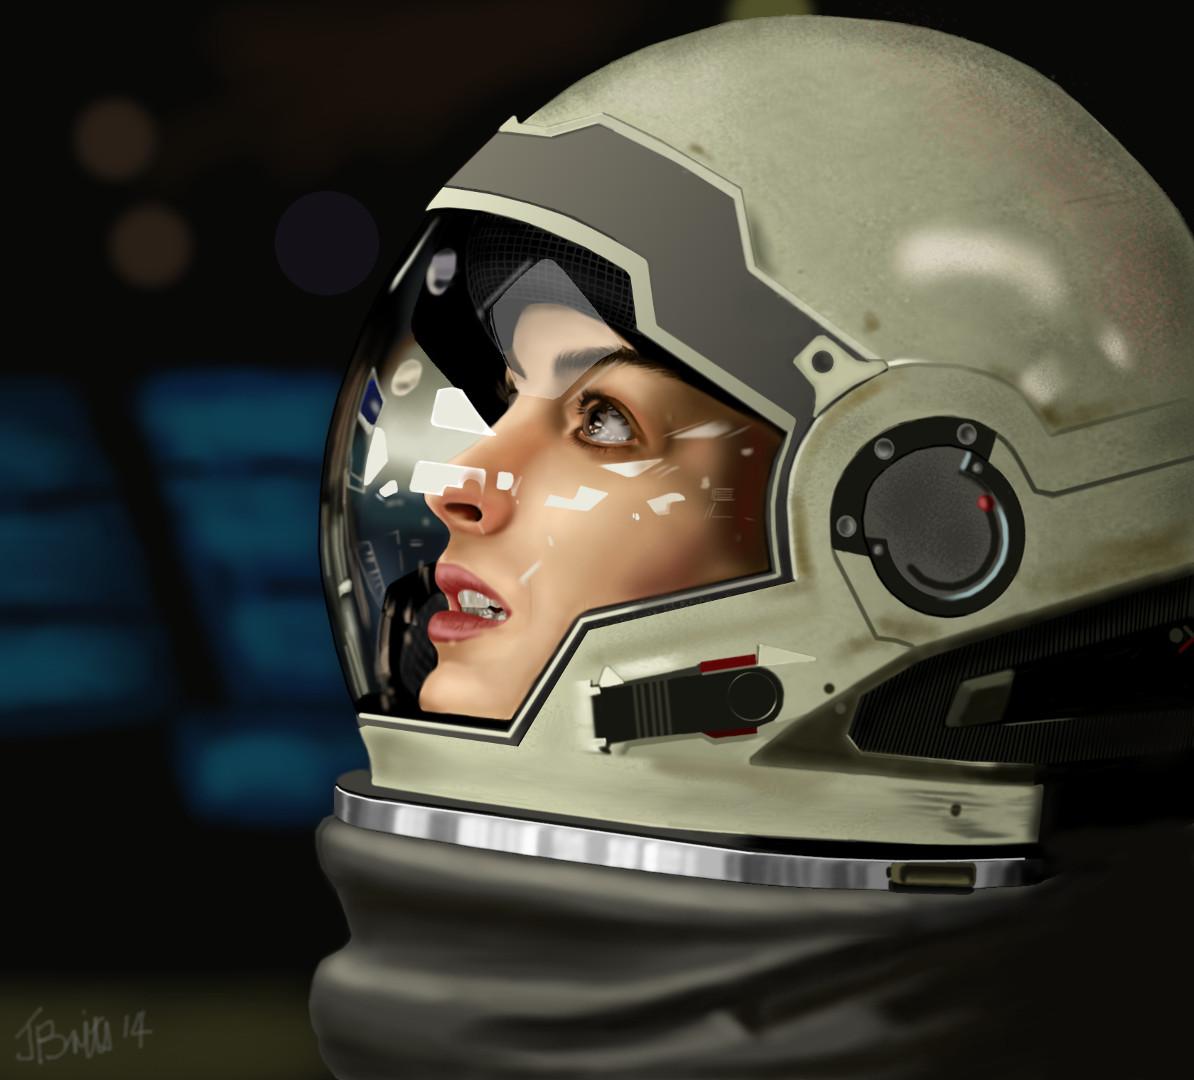 Anne Hathaway Drawing: Anne Hathaway By Britsie1 On Newgrounds